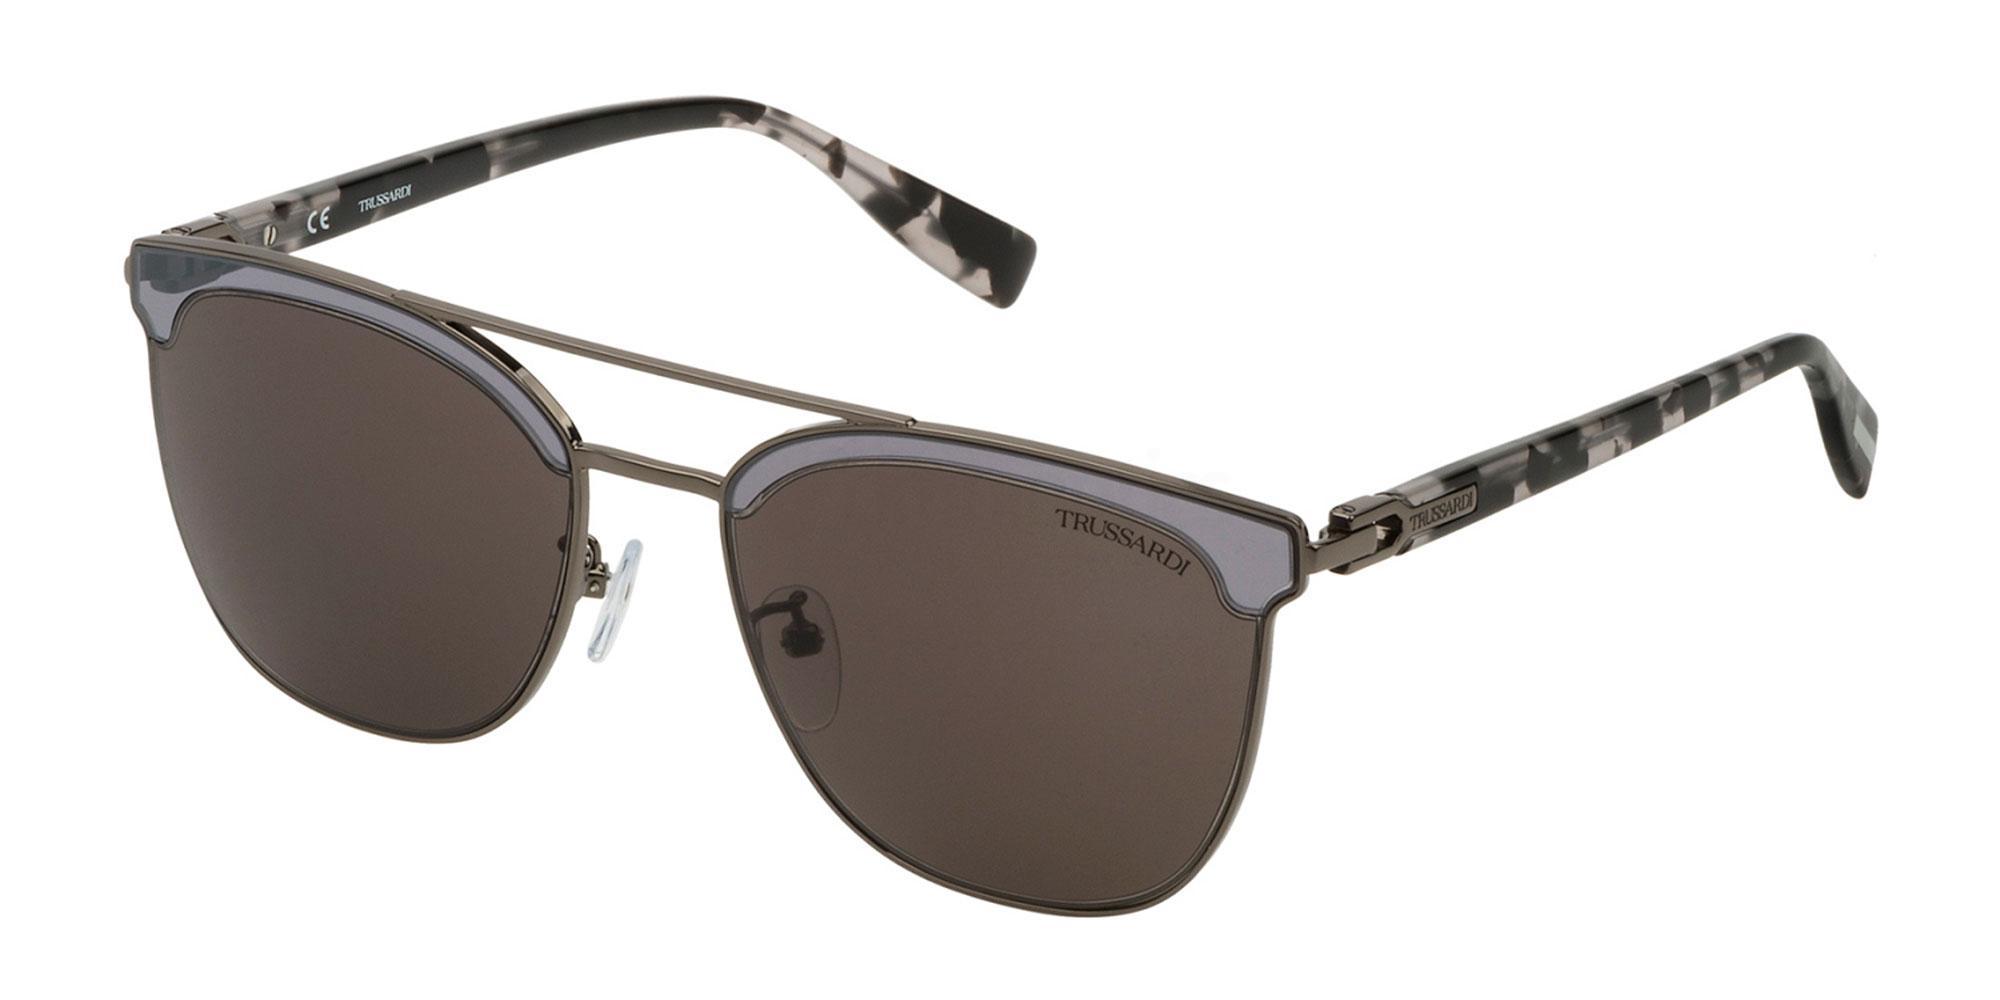 0568 STR305 Sunglasses, Trussardi